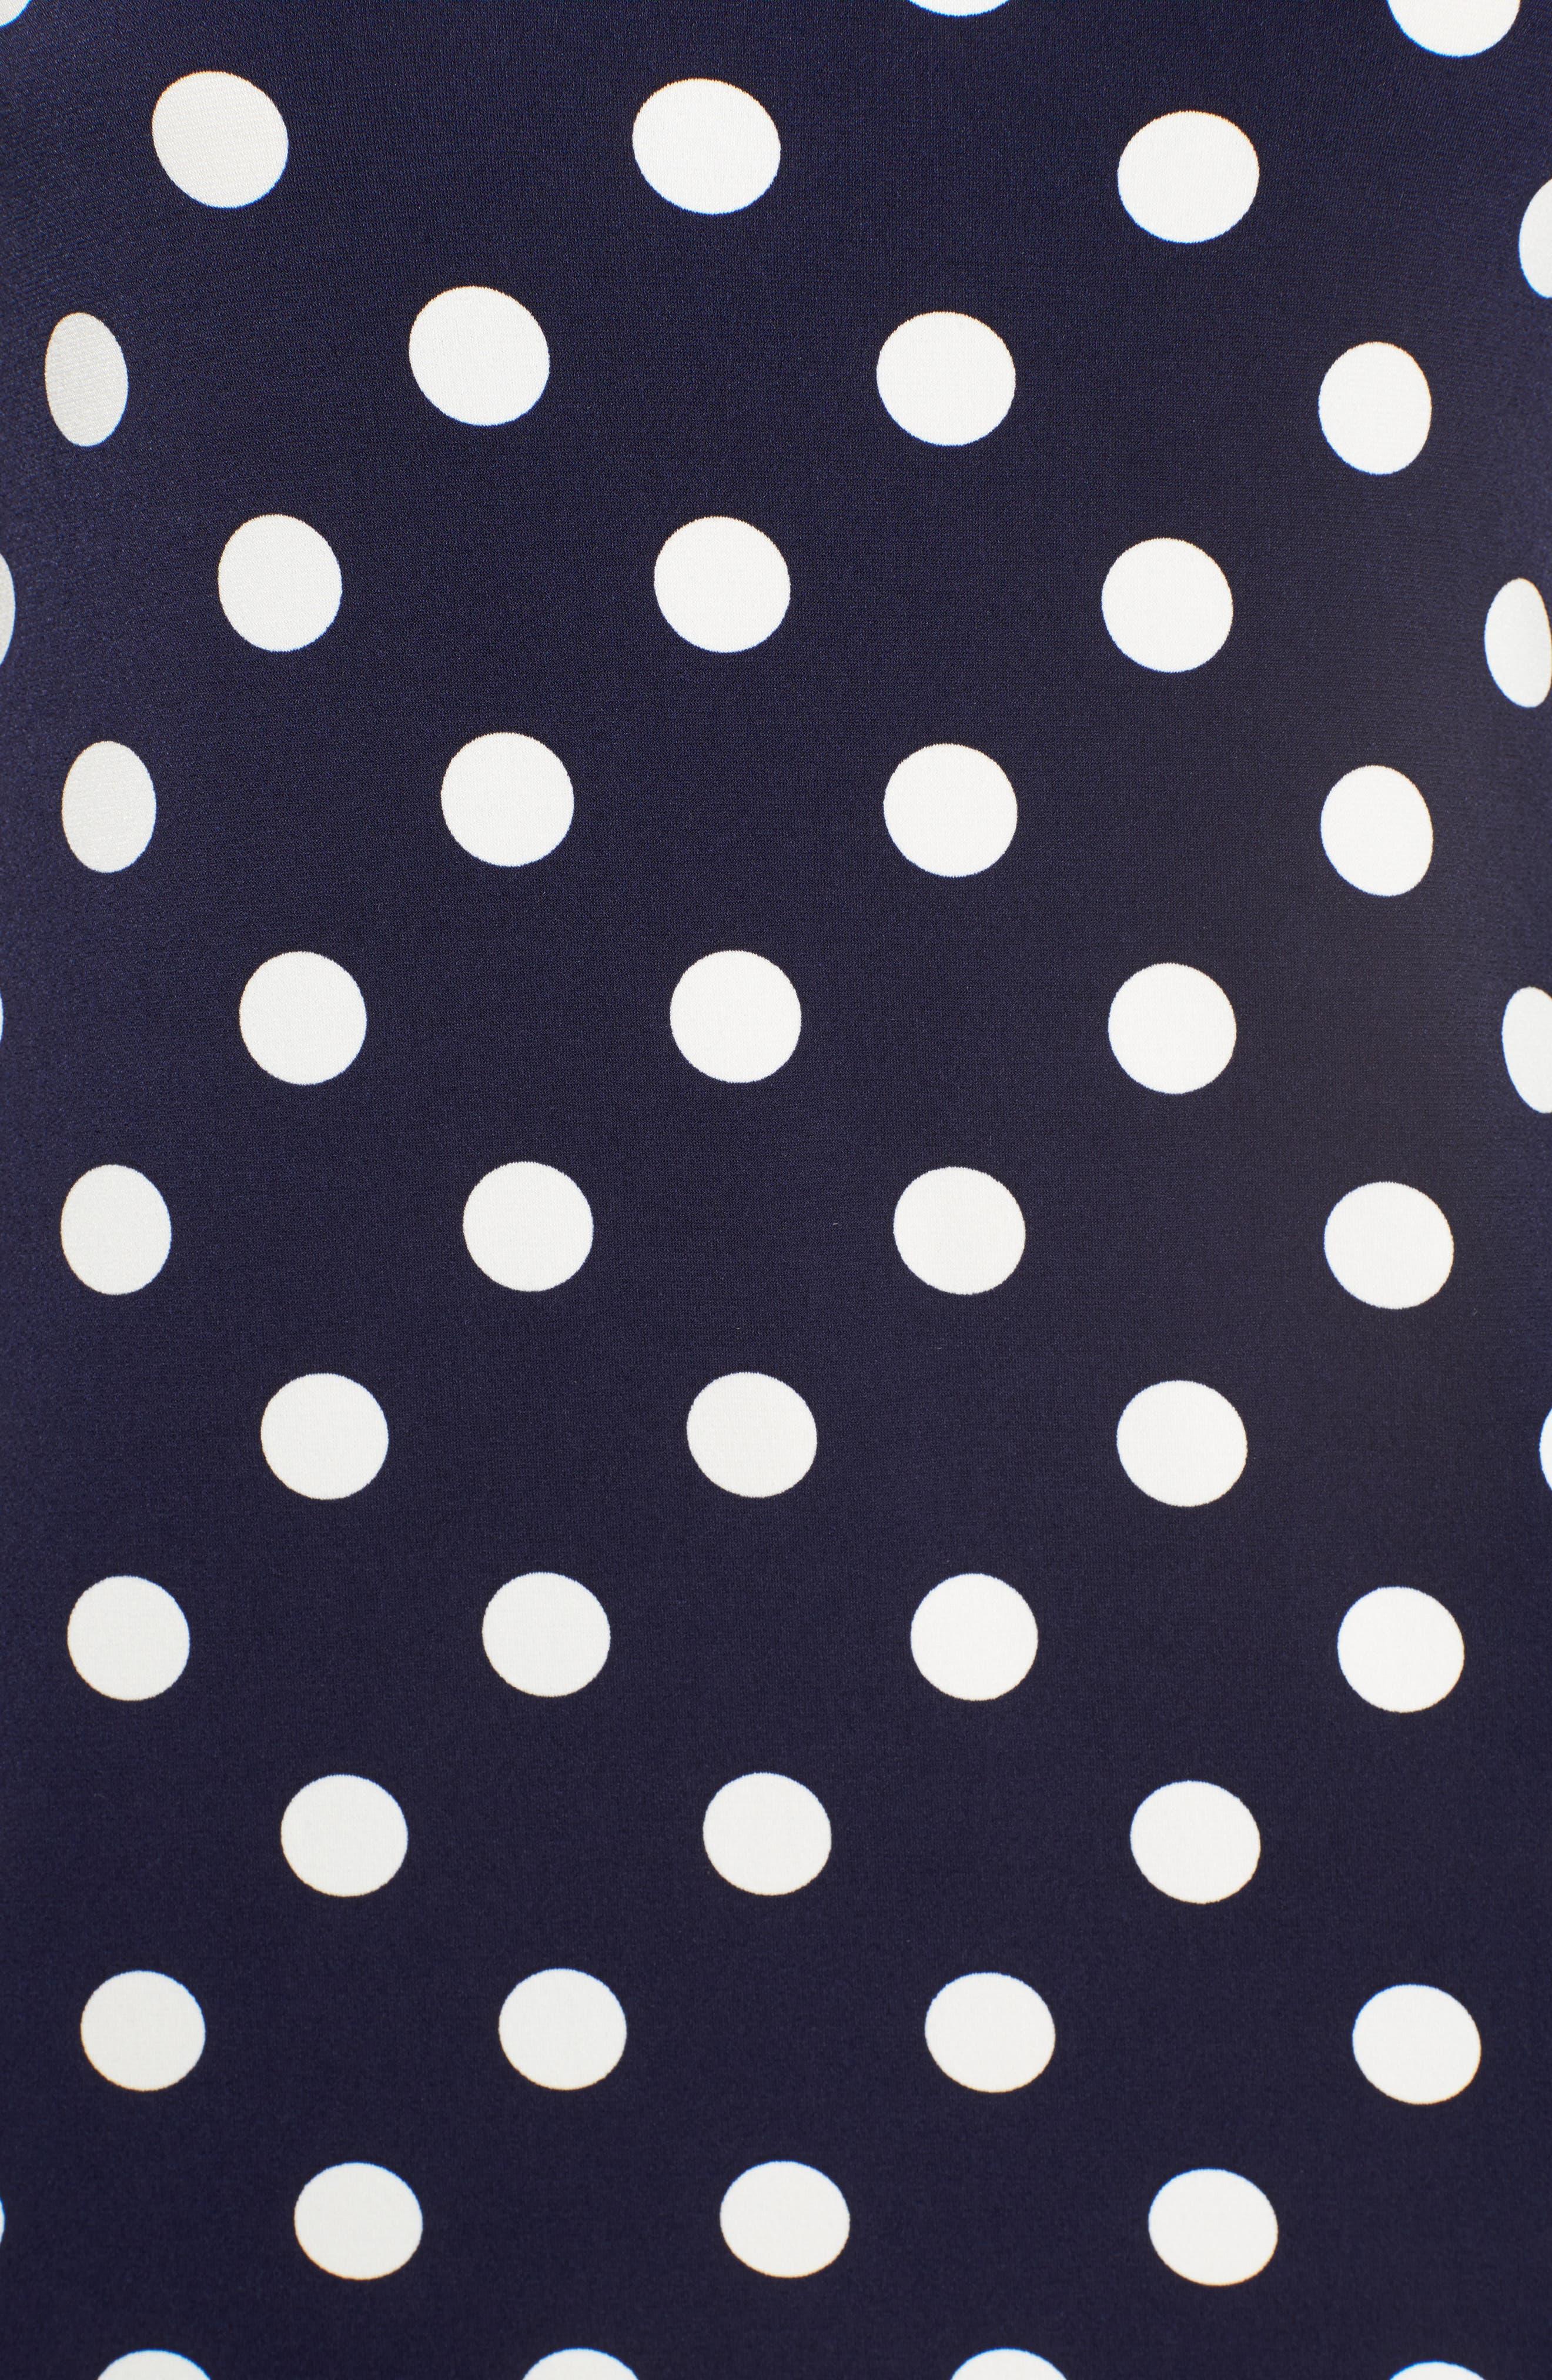 Dot Print Bell Sleeve Blouse,                             Alternate thumbnail 5, color,                             529-Evening Navy